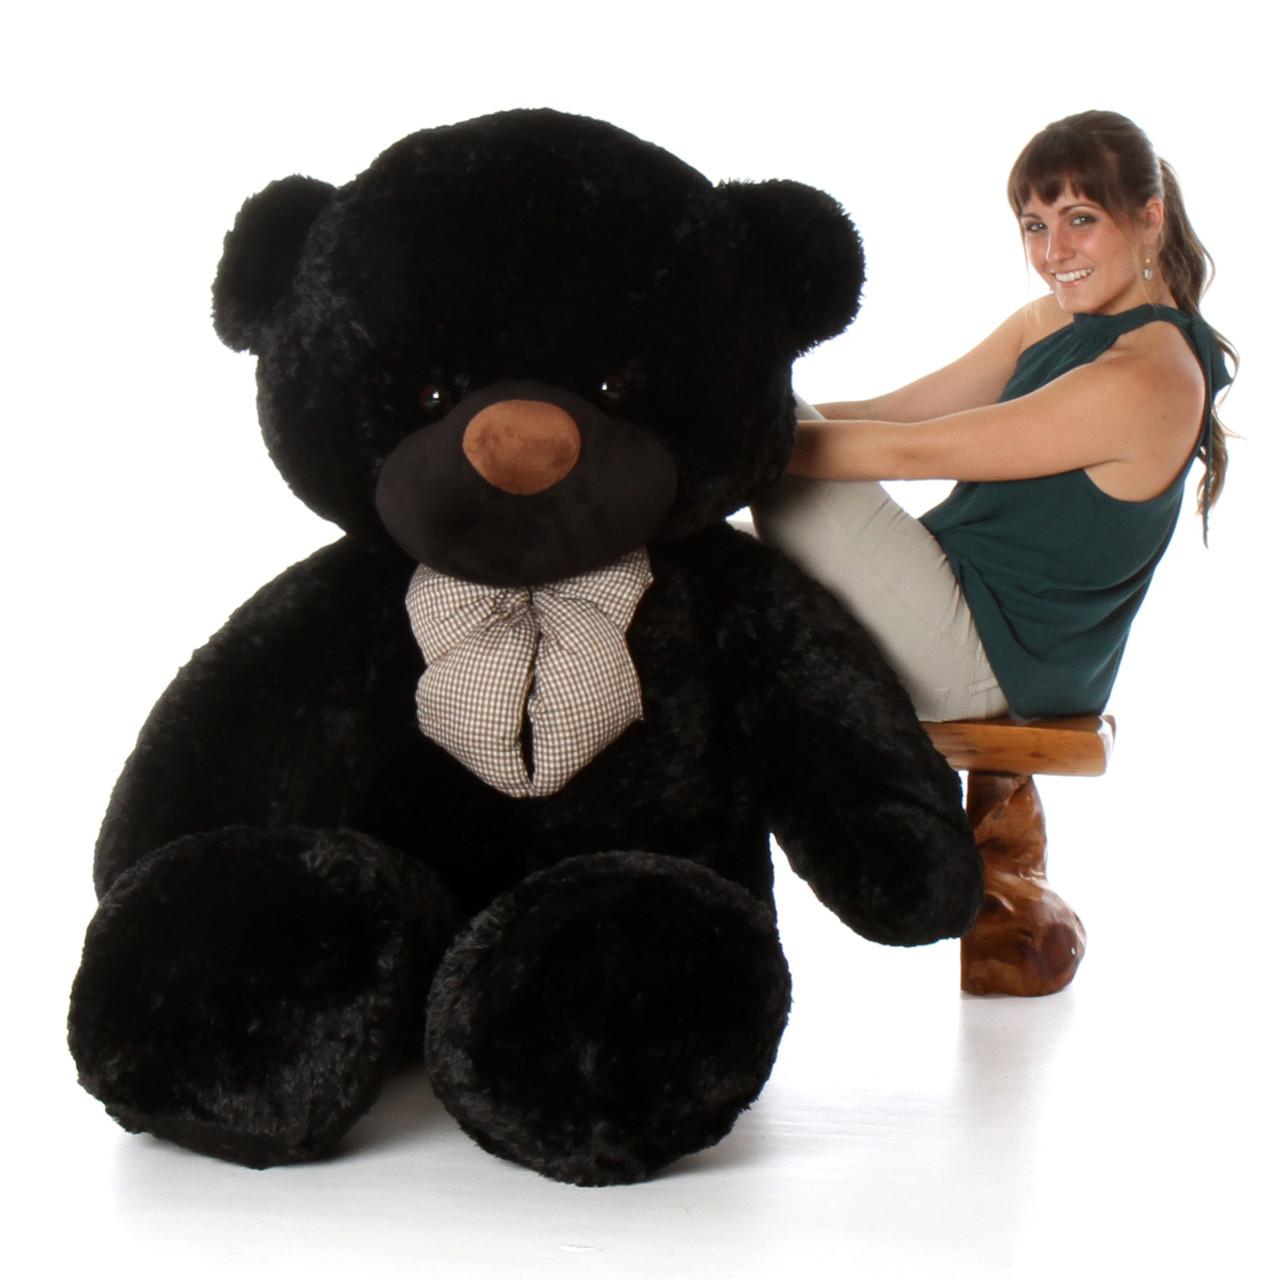 6ft Life Size Teddy Bear Juju Cuddles Soft And Huggable